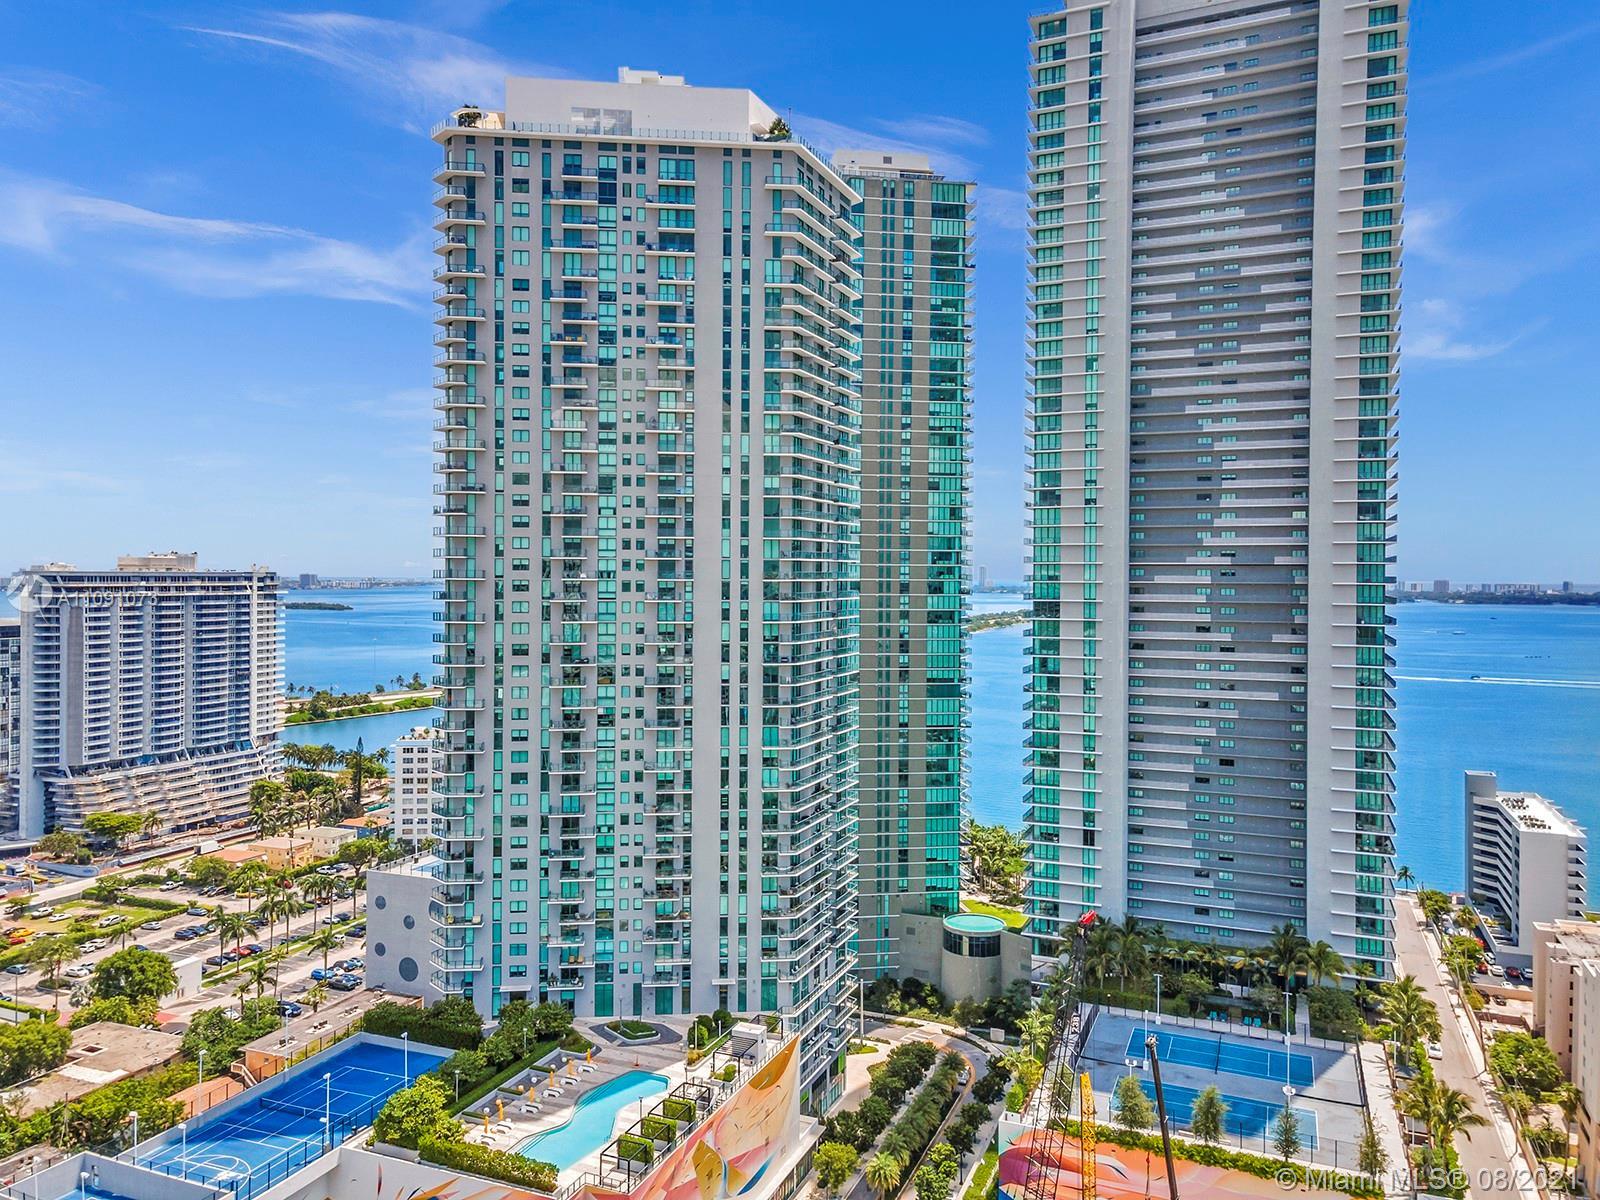 Paraiso Bayviews #PH4205 - 501 NE 31st St #PH4205, Miami, FL 33137